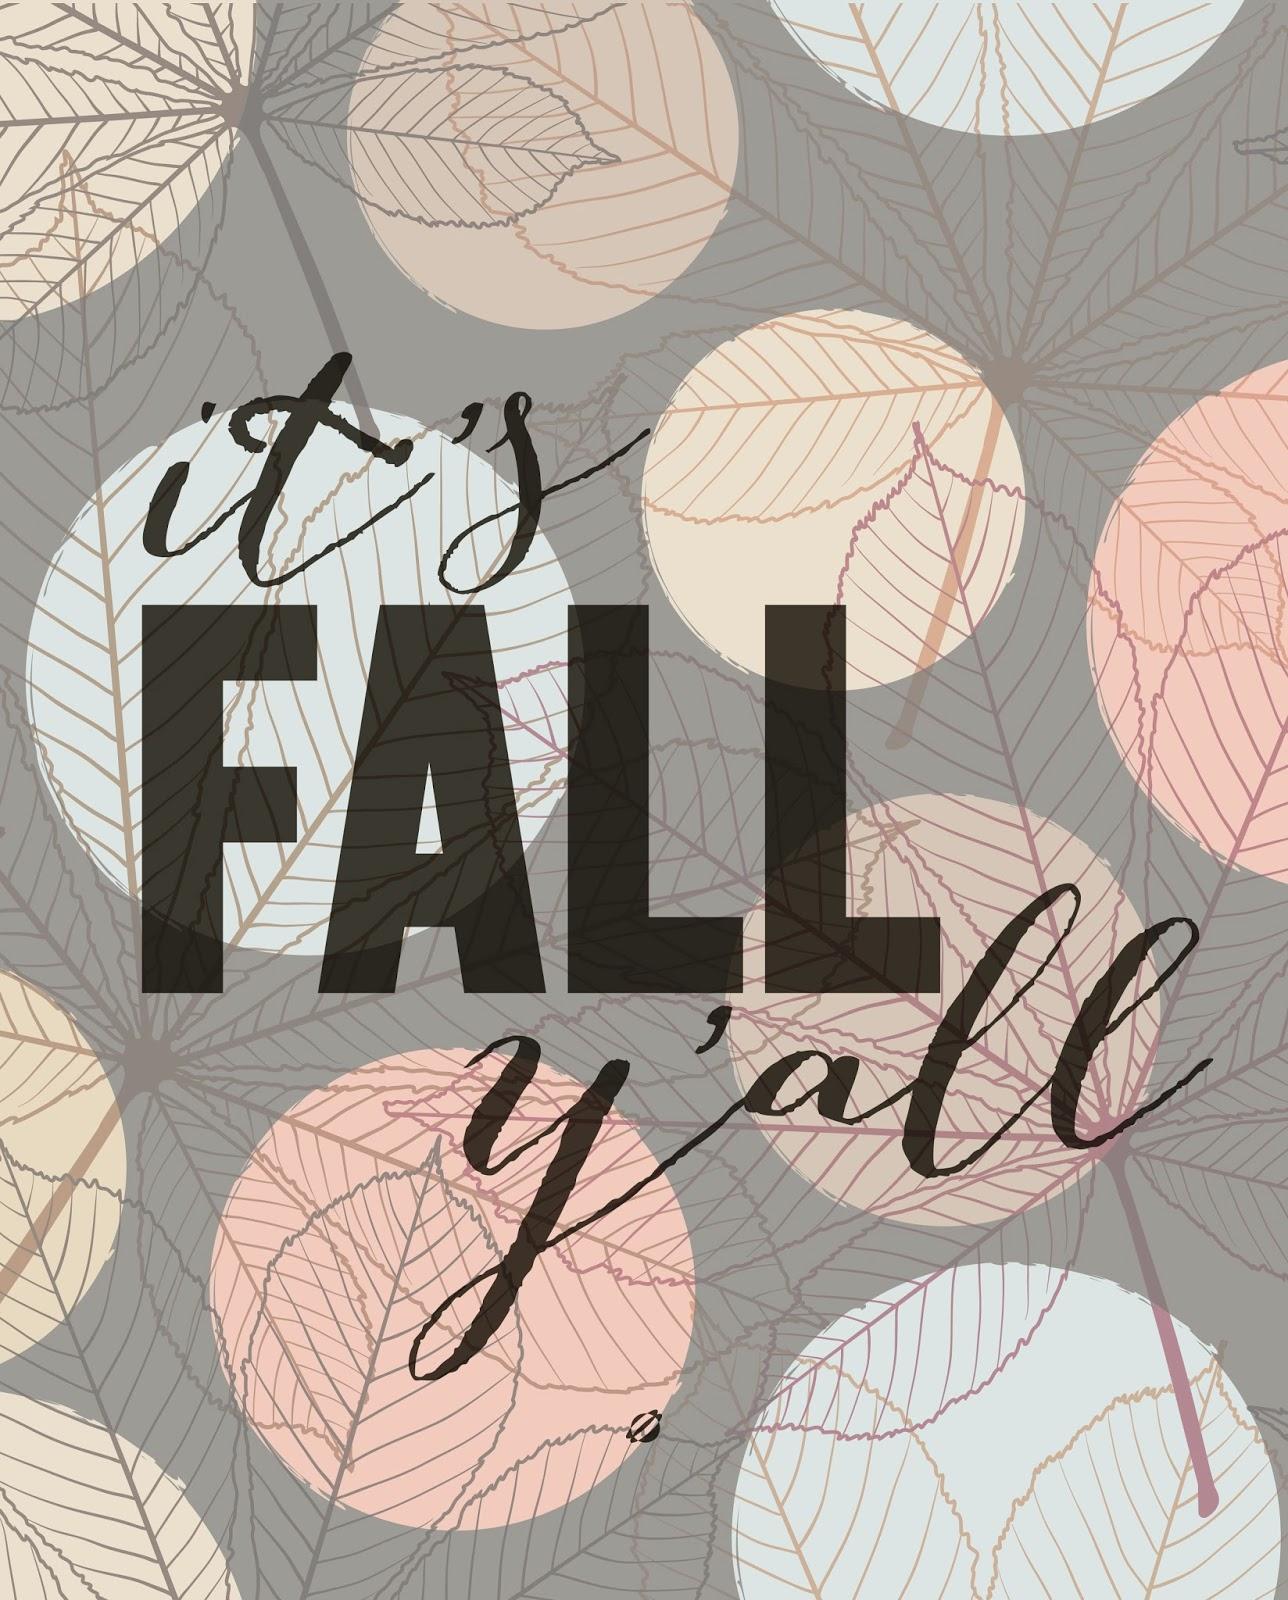 It's Fall Y'all LostBumblebee 2013